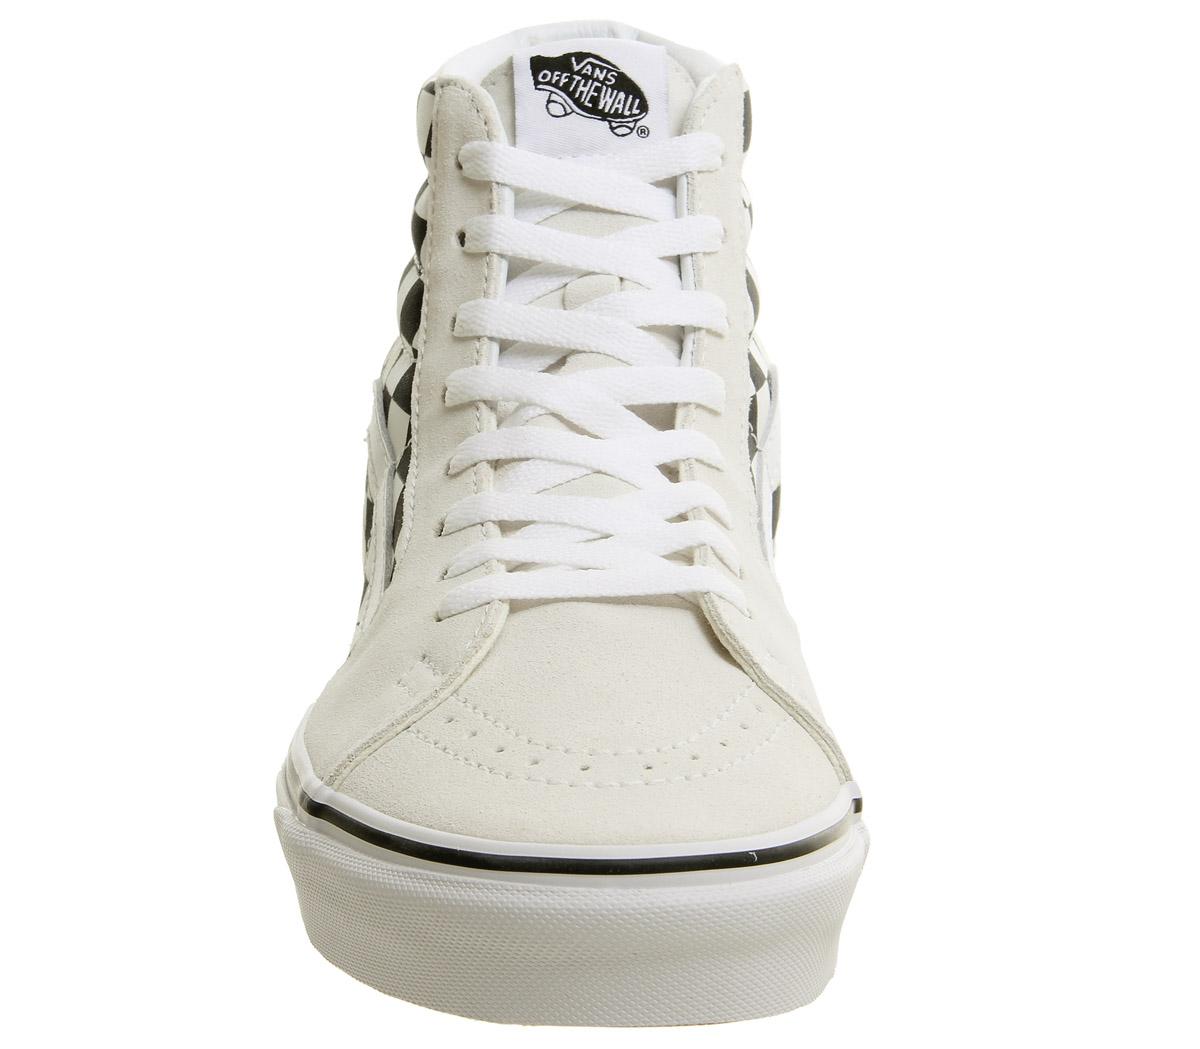 Herren Vans Sk8 Hi Hi Sk8 Trainers CLASSIC Weiß FLAME CHECKER Trainers Schuhes 1fca76